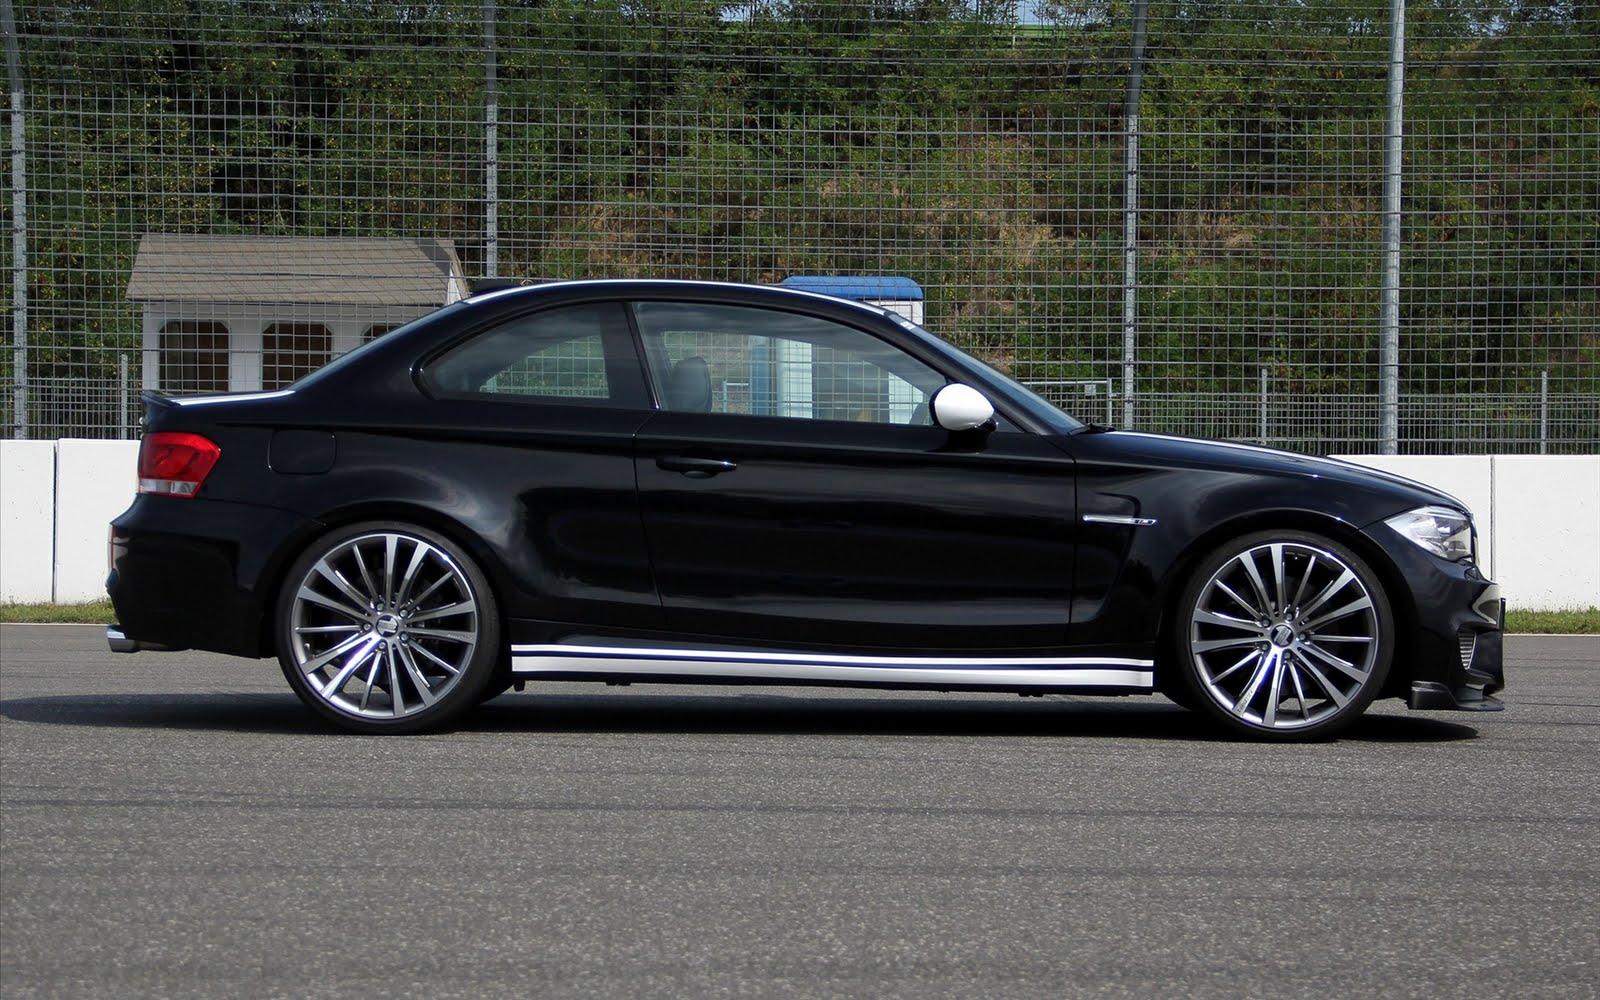 kelleners sport ks1 s bmw 1 series m coupe 2011 car wallpaper car pictures. Black Bedroom Furniture Sets. Home Design Ideas